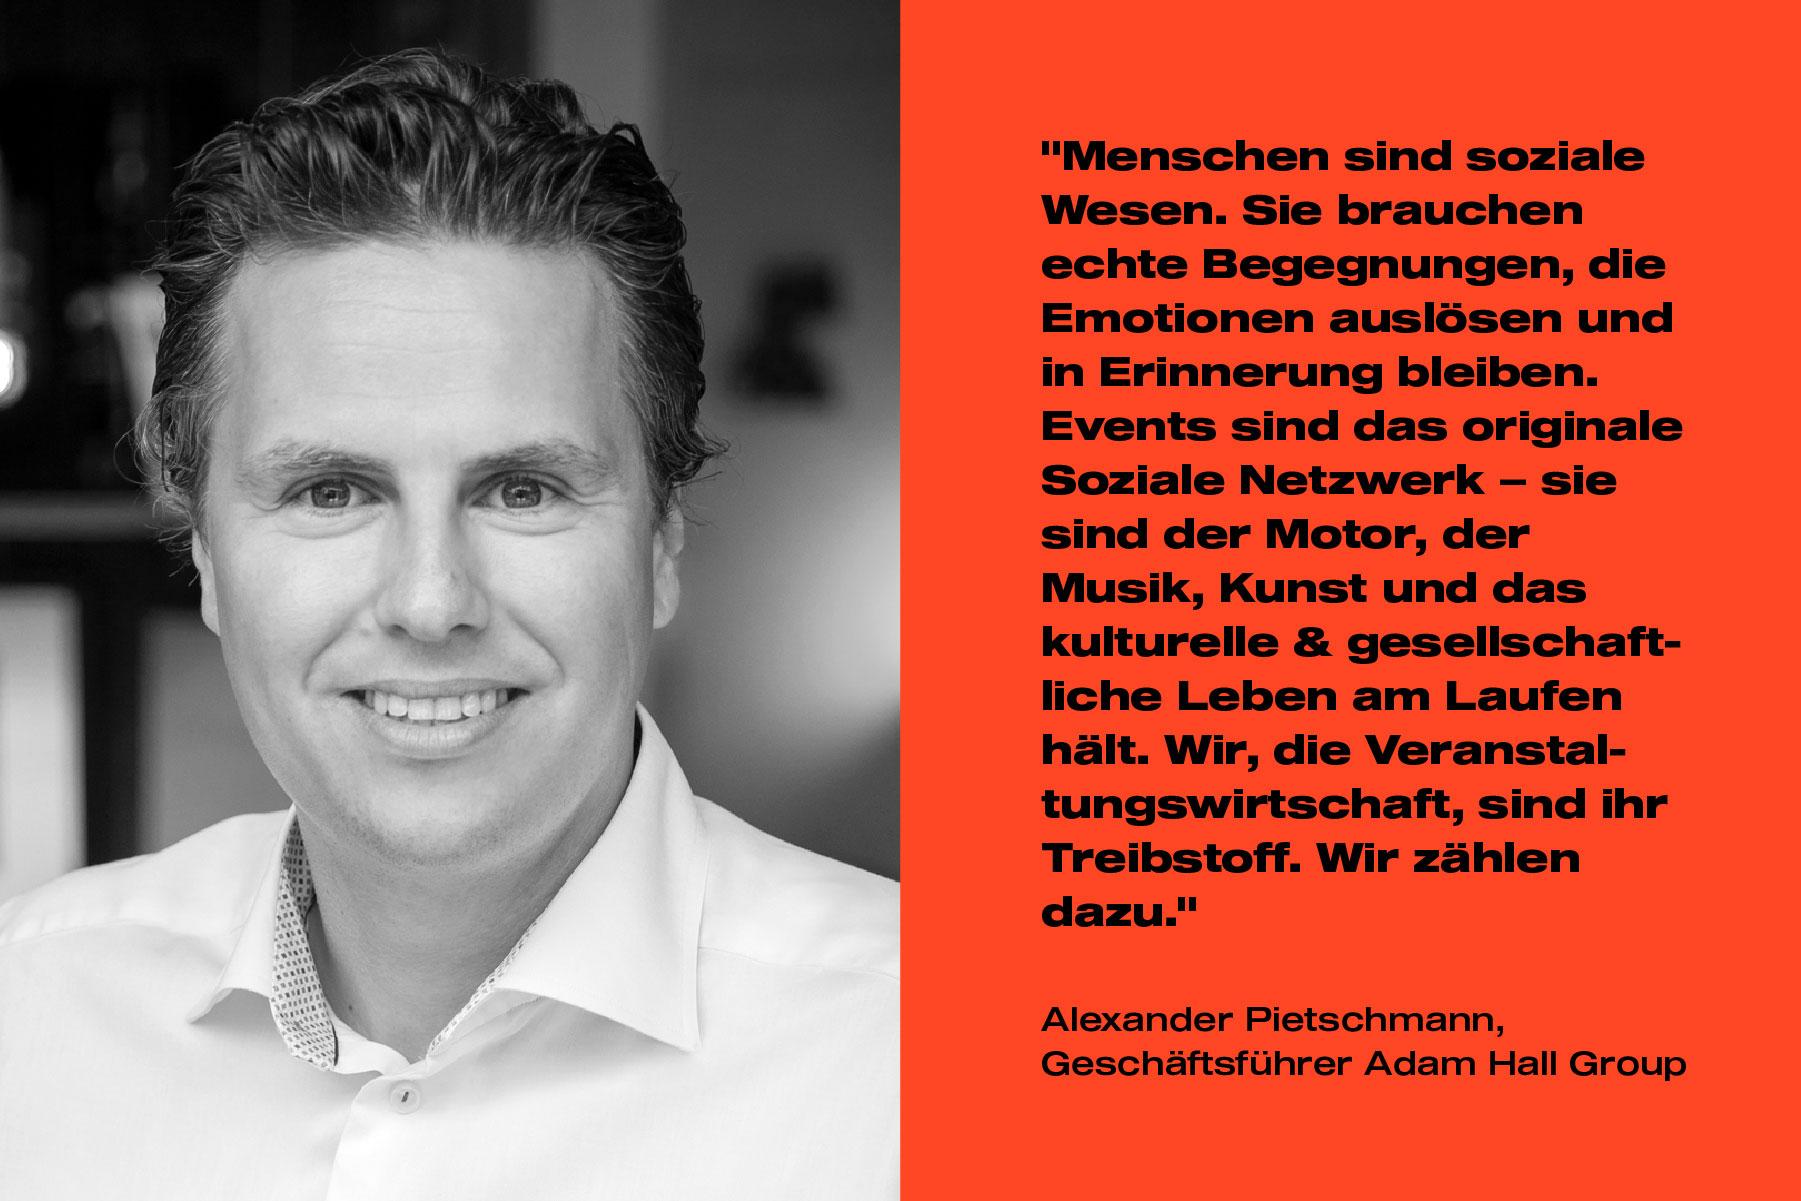 Zähl dazu Alexander Pietschmann